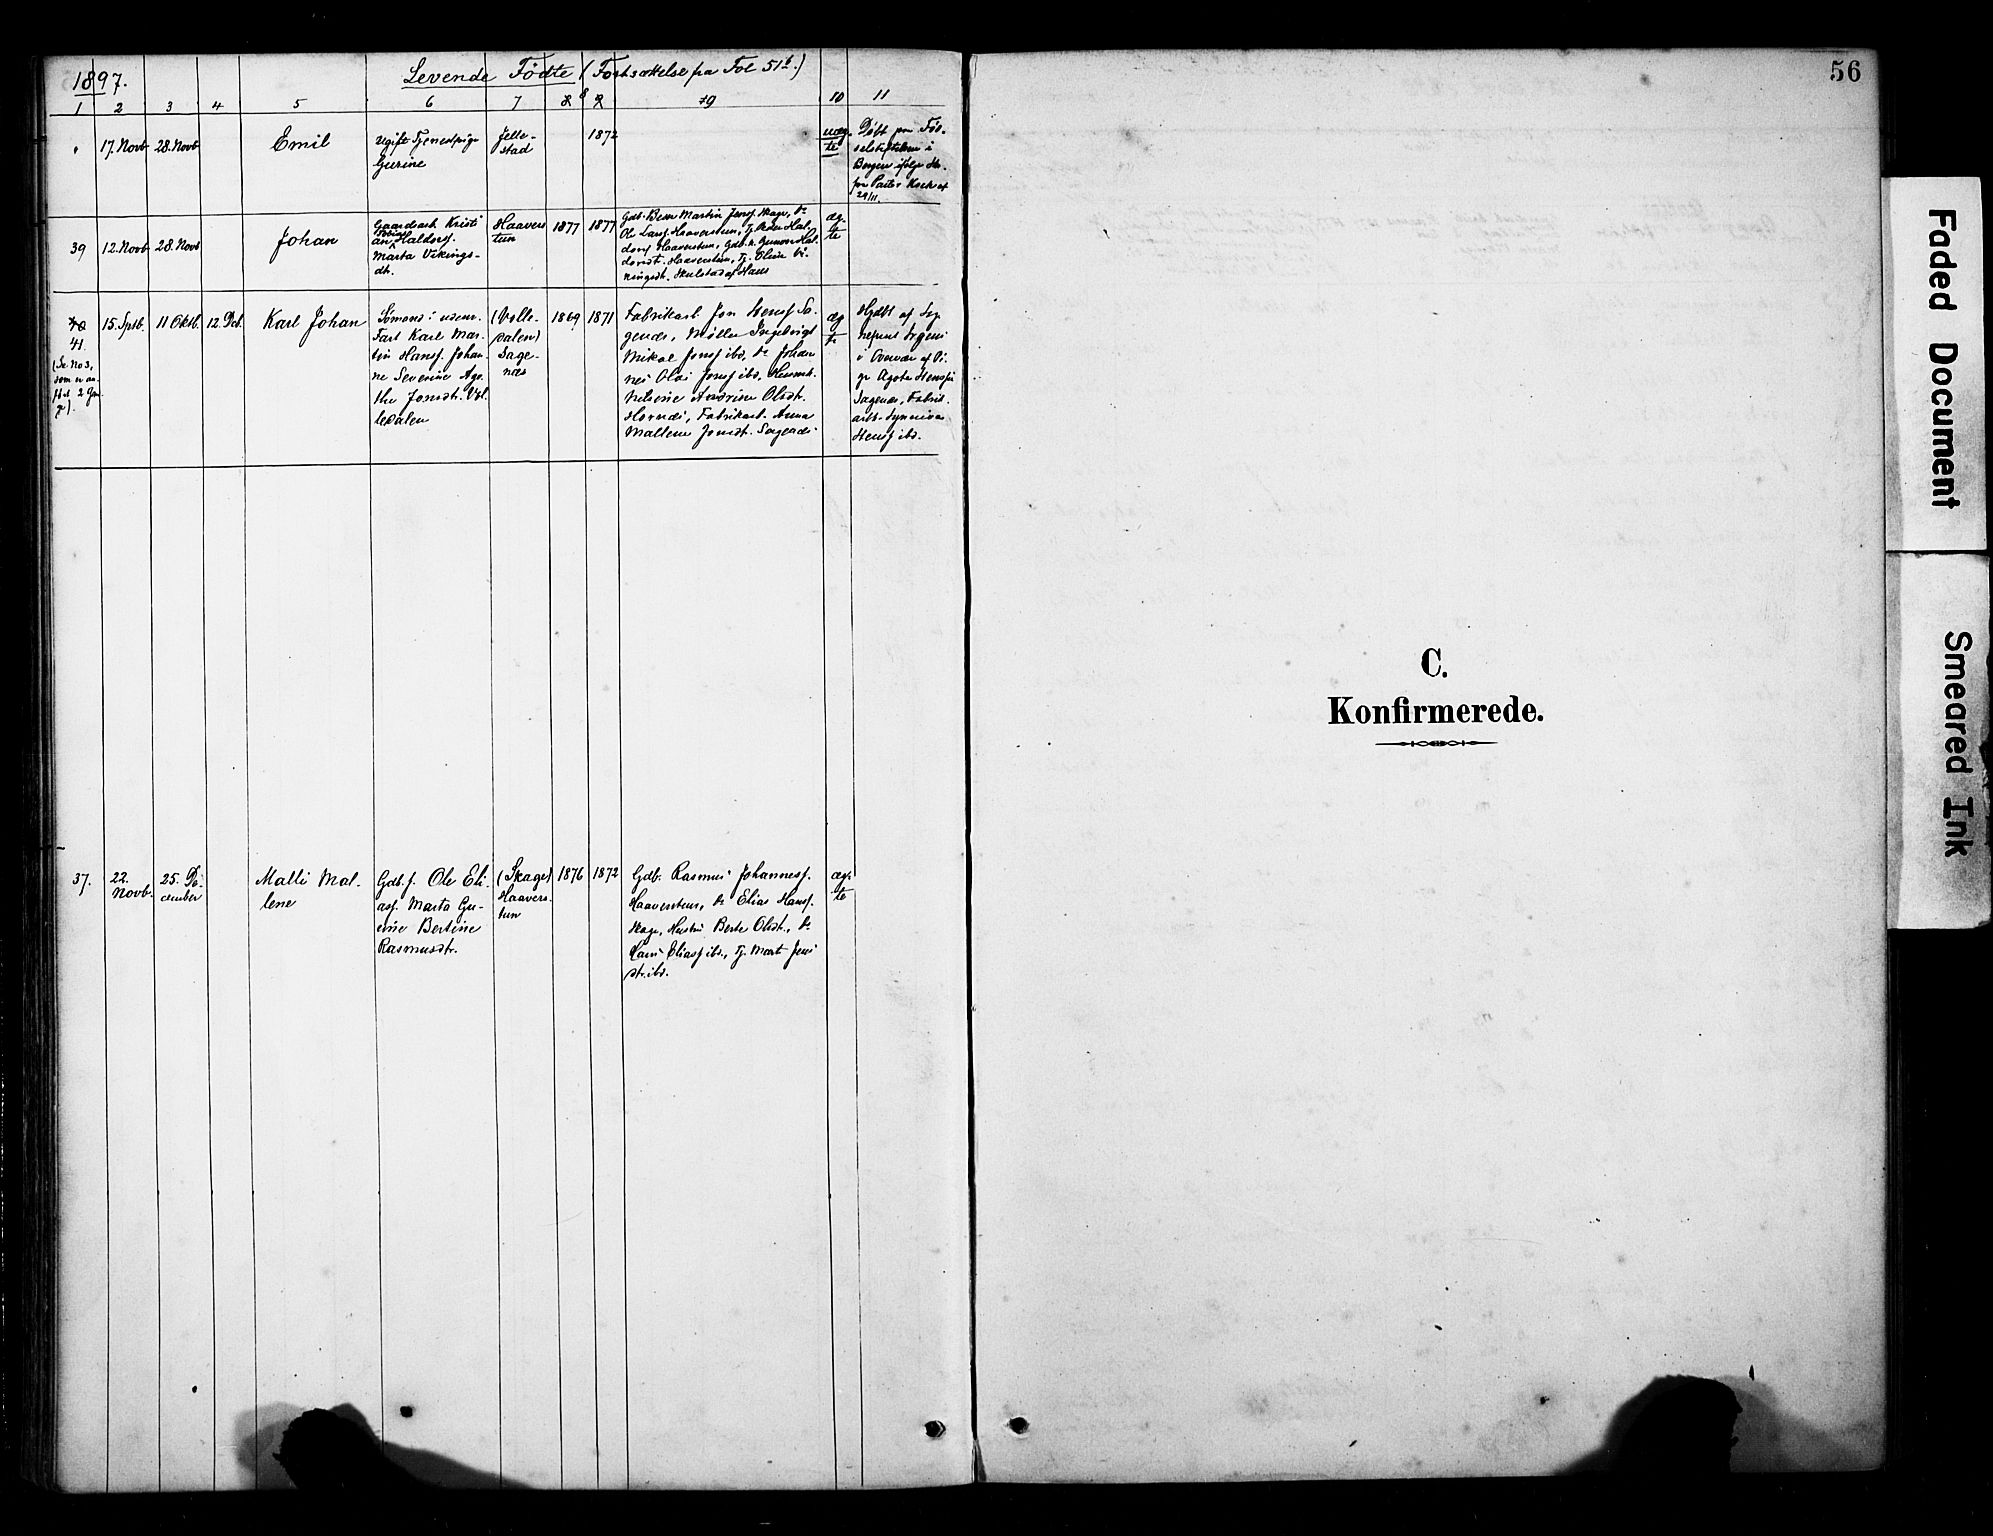 SAB, Fana Sokneprestembete, H/Haa/Haab/L0002: Ministerialbok nr. B 2, 1890-1897, s. 56